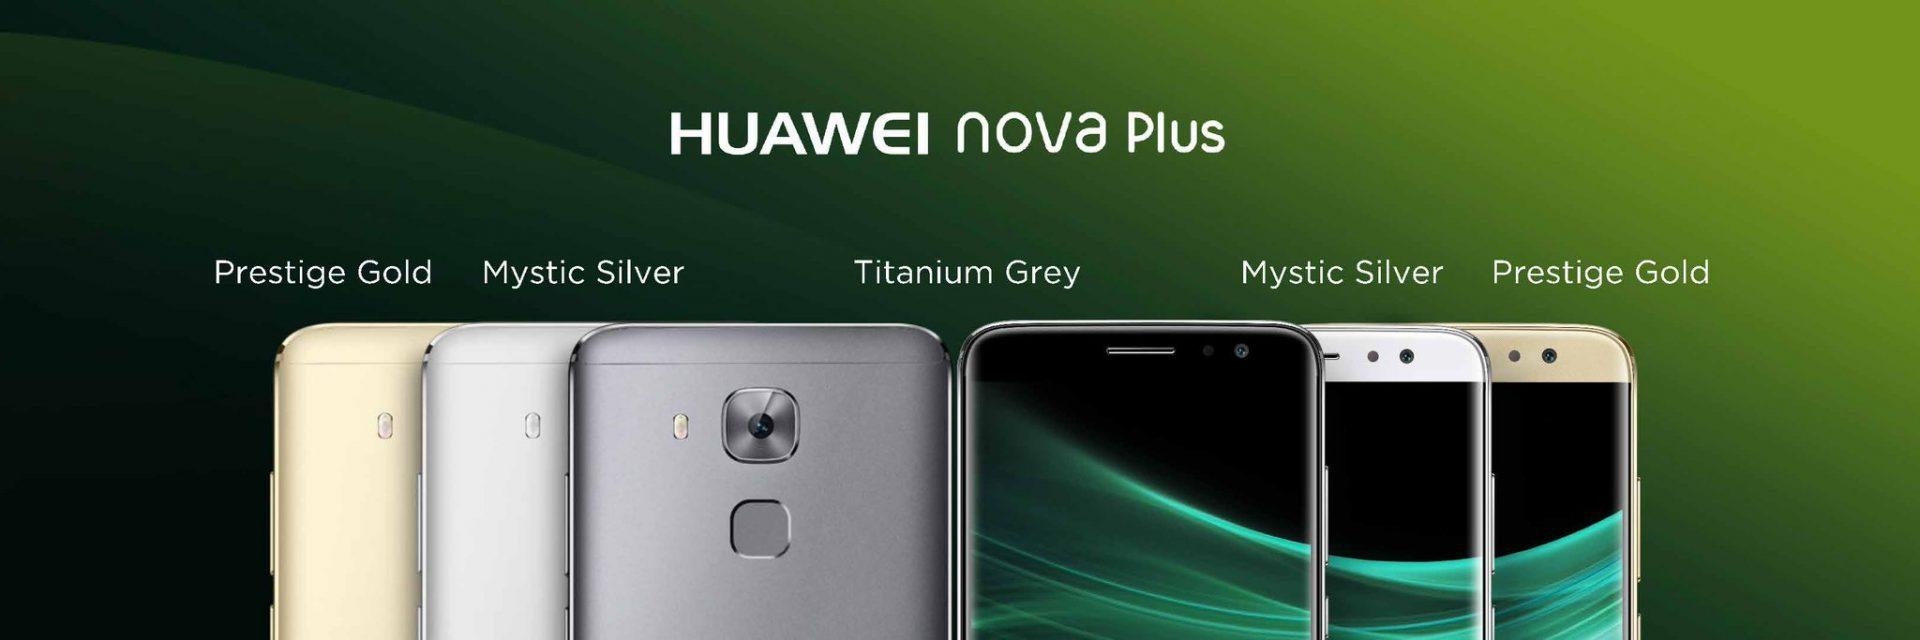 Huawei Nova Huawei Nova Plus IFA 2016